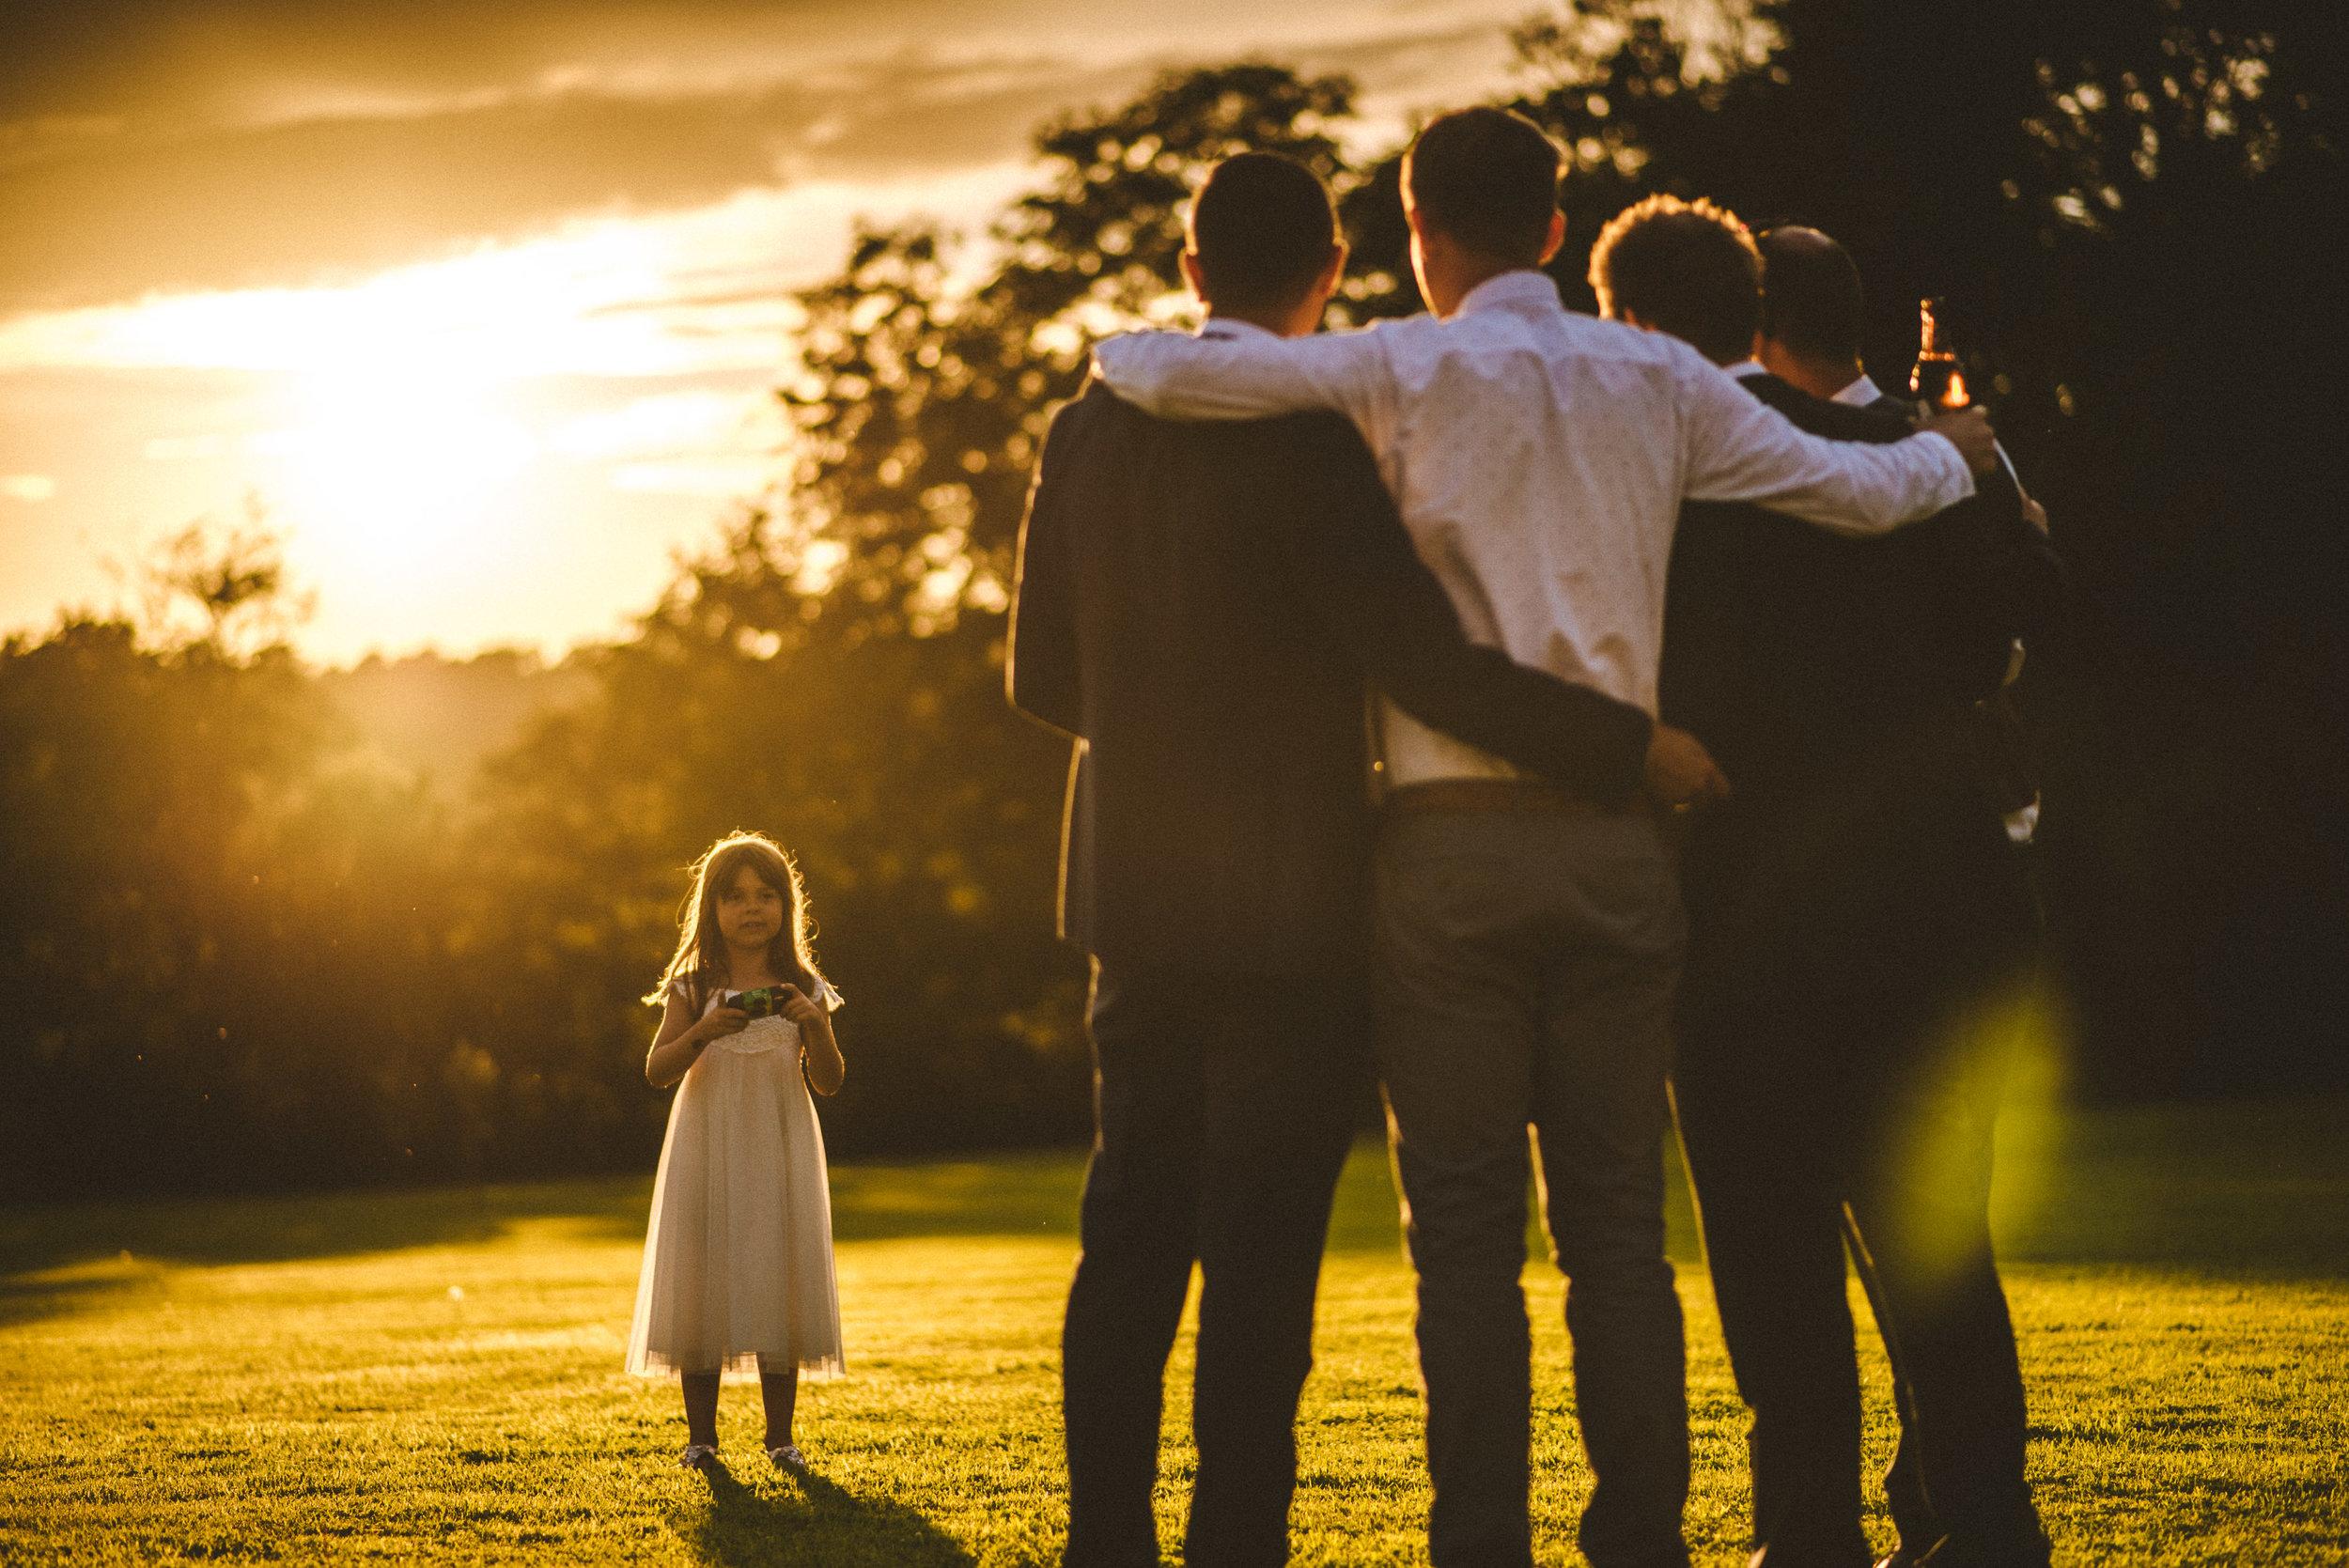 pencarrow-house-wedding-photographer-132.jpg